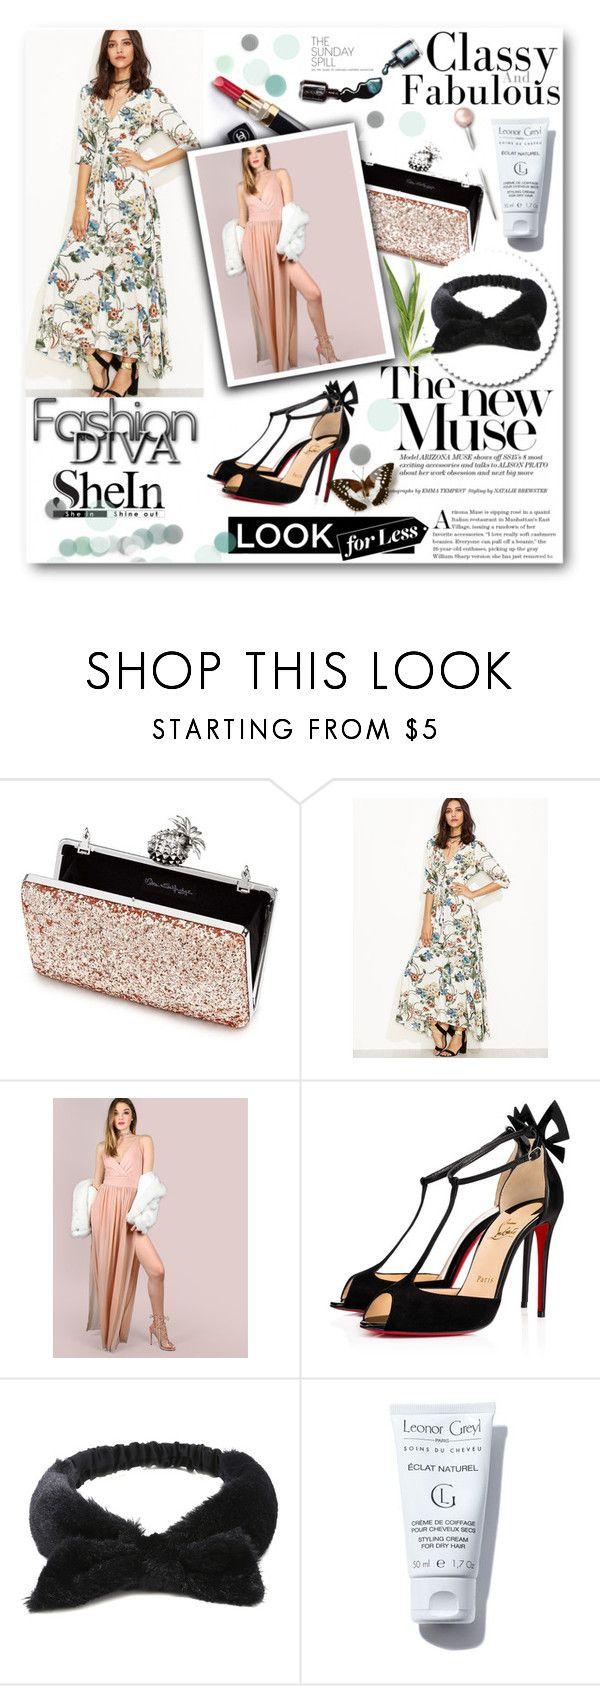 """Shein 7/ II"" by ajisa-ikanovic ❤ liked on Polyvore featuring Miss Selfridge, Christian Louboutin, Chanel and Dolce&Gabbana"